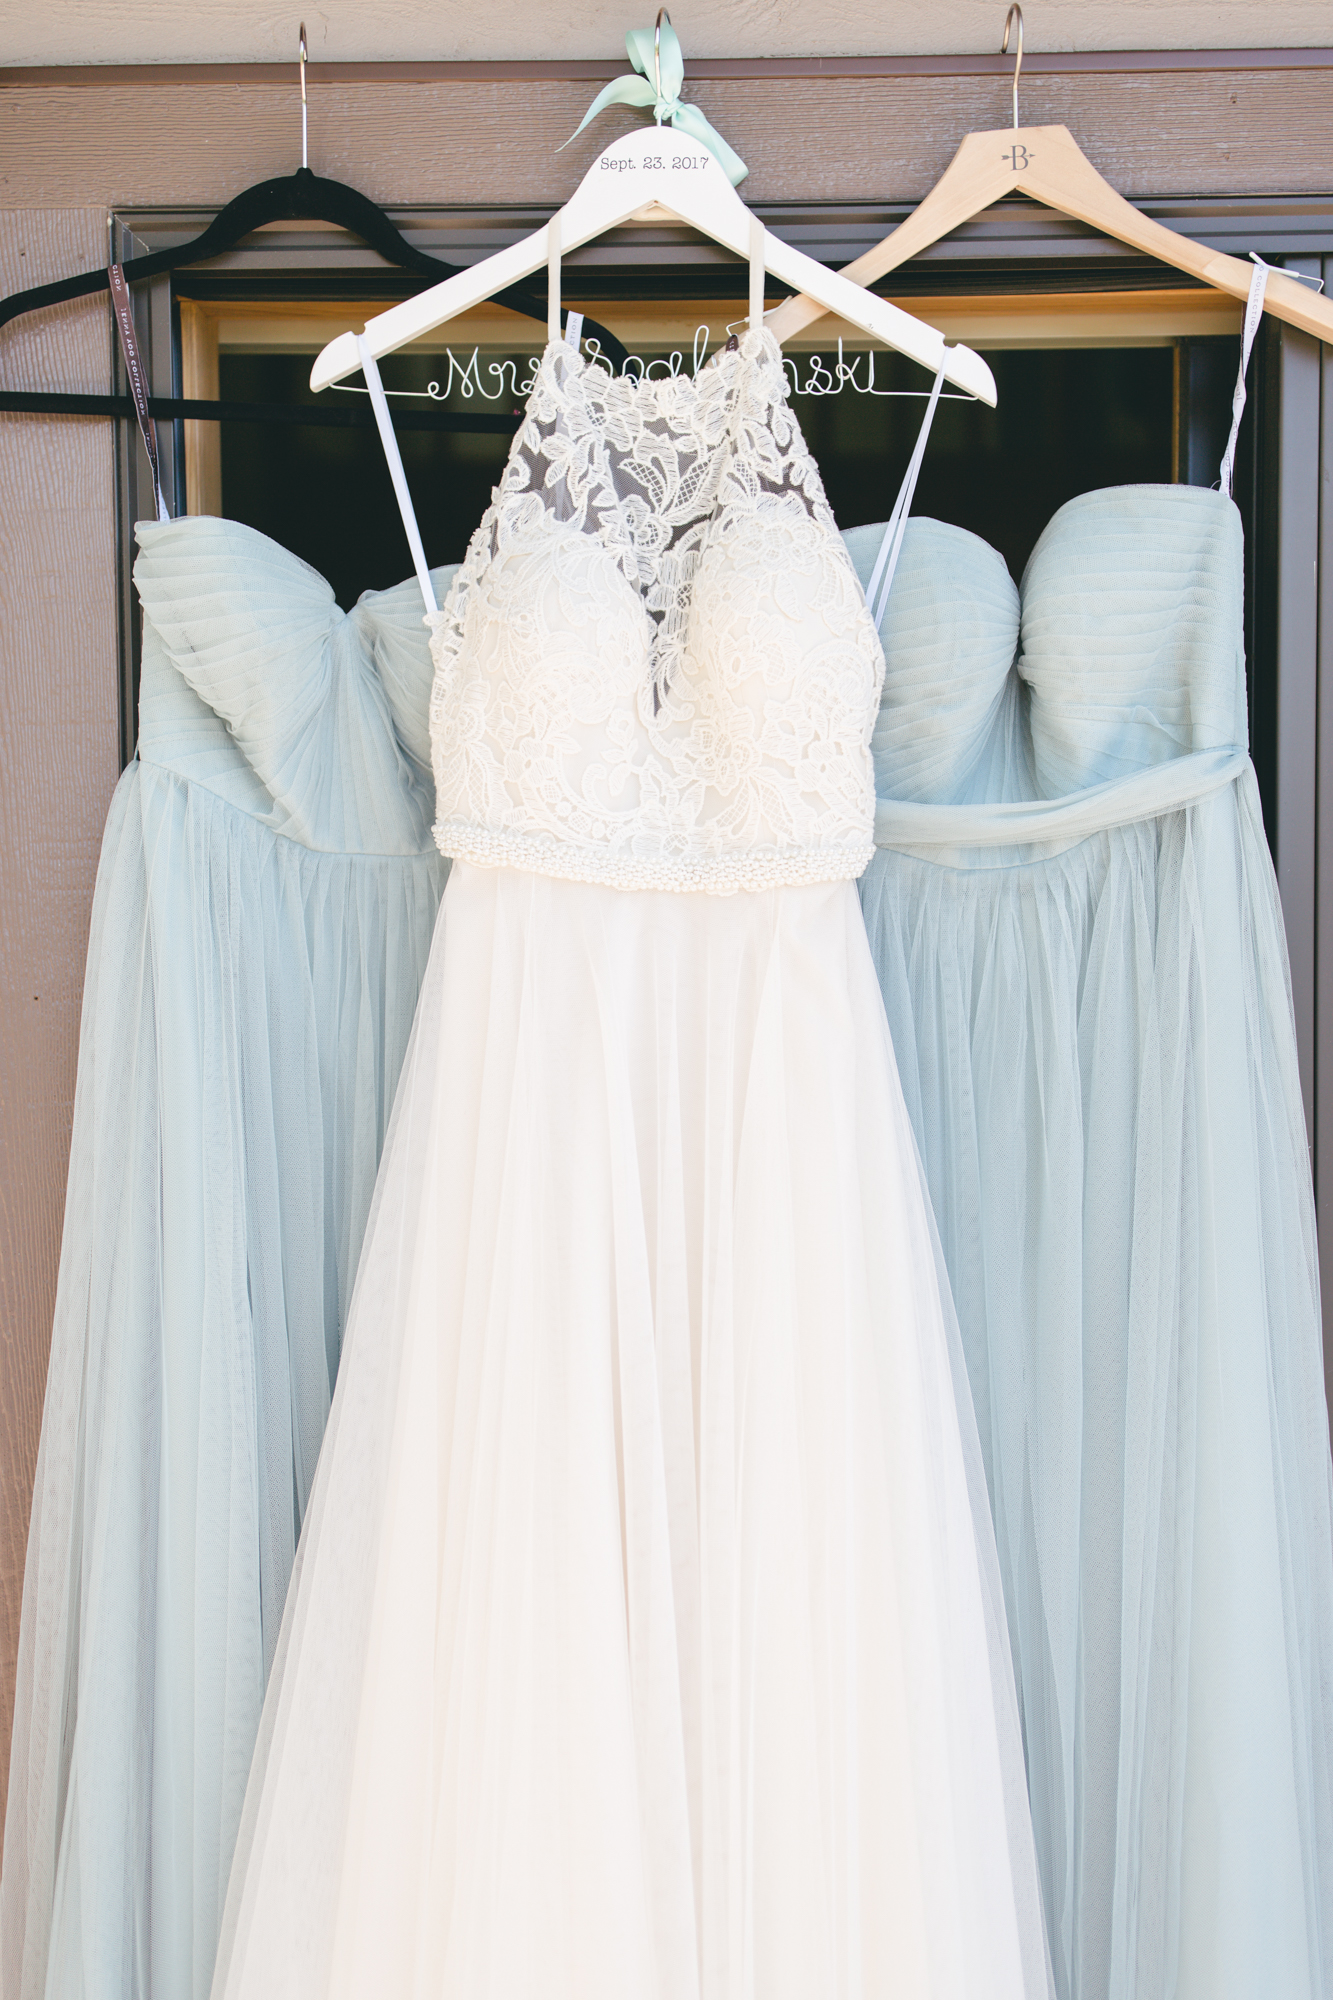 Wintergreen Resort Wedding | Maral Noori Photography | Charlottesville Virginia Wedding Photographer | Bhldn Josie Gown | Jenny Yoo Annabelle Dress Seaglass